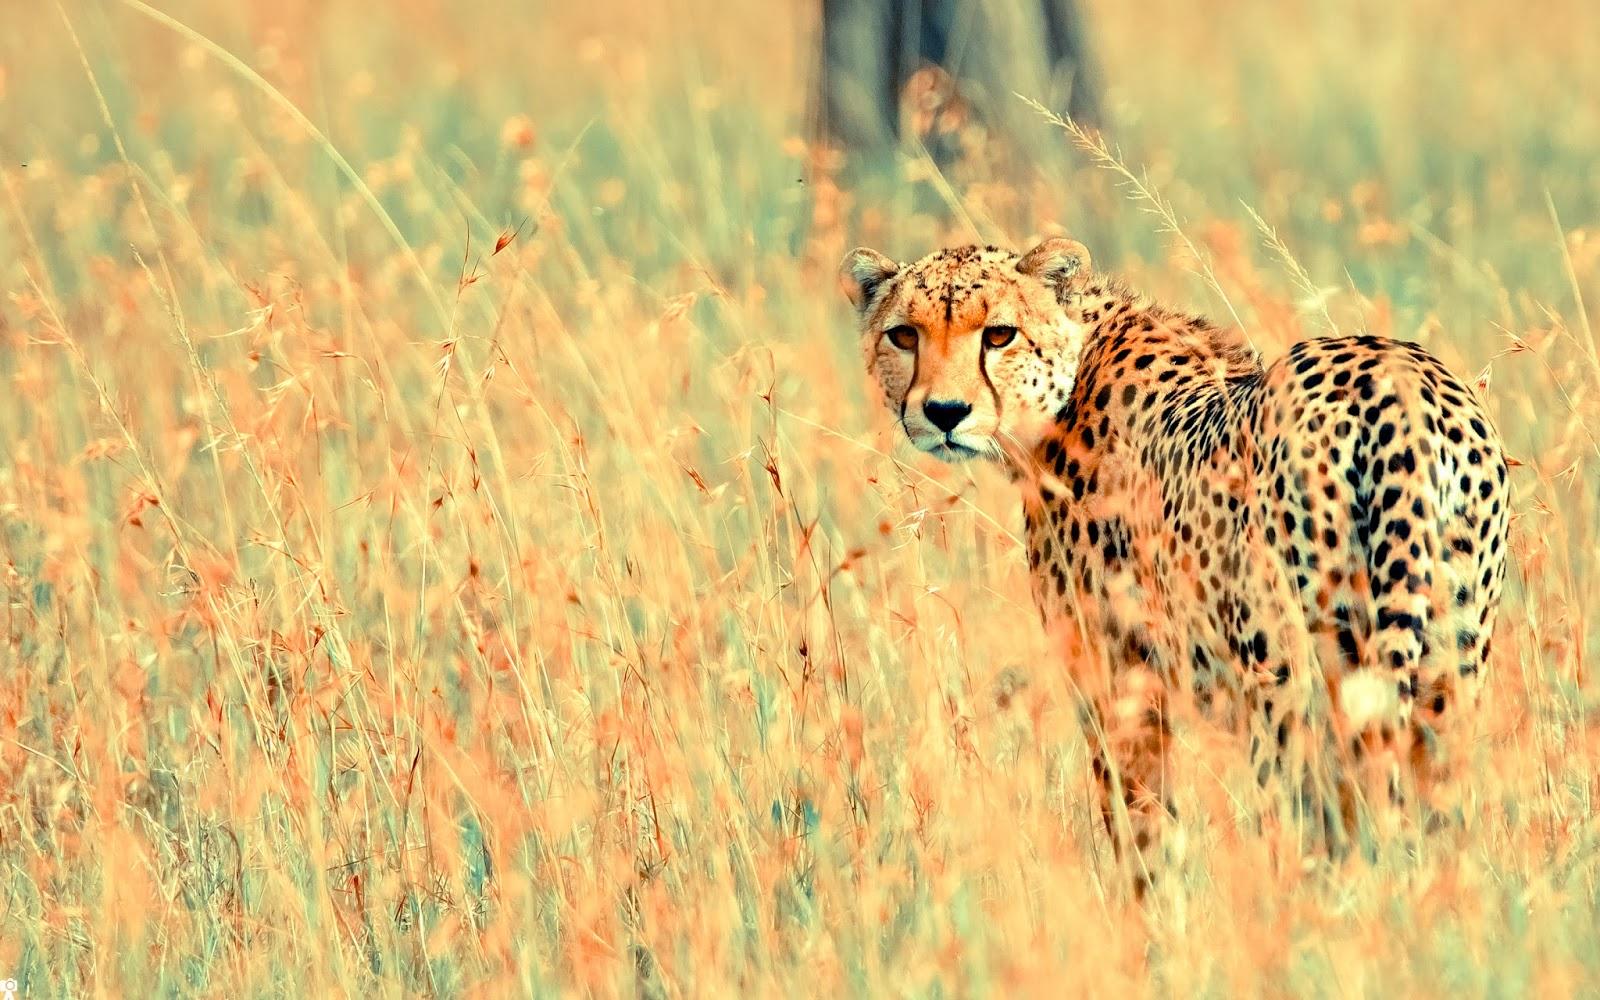 "<img src=""http://4.bp.blogspot.com/-Z8v18TcDvtM/UtgFk25kXEI/AAAAAAAAIRs/Vv4FLaUUj9g/s1600/animal-wallpapers-beautiful-cheetah.jpg"" alt=""Animal wallpapers"" />"